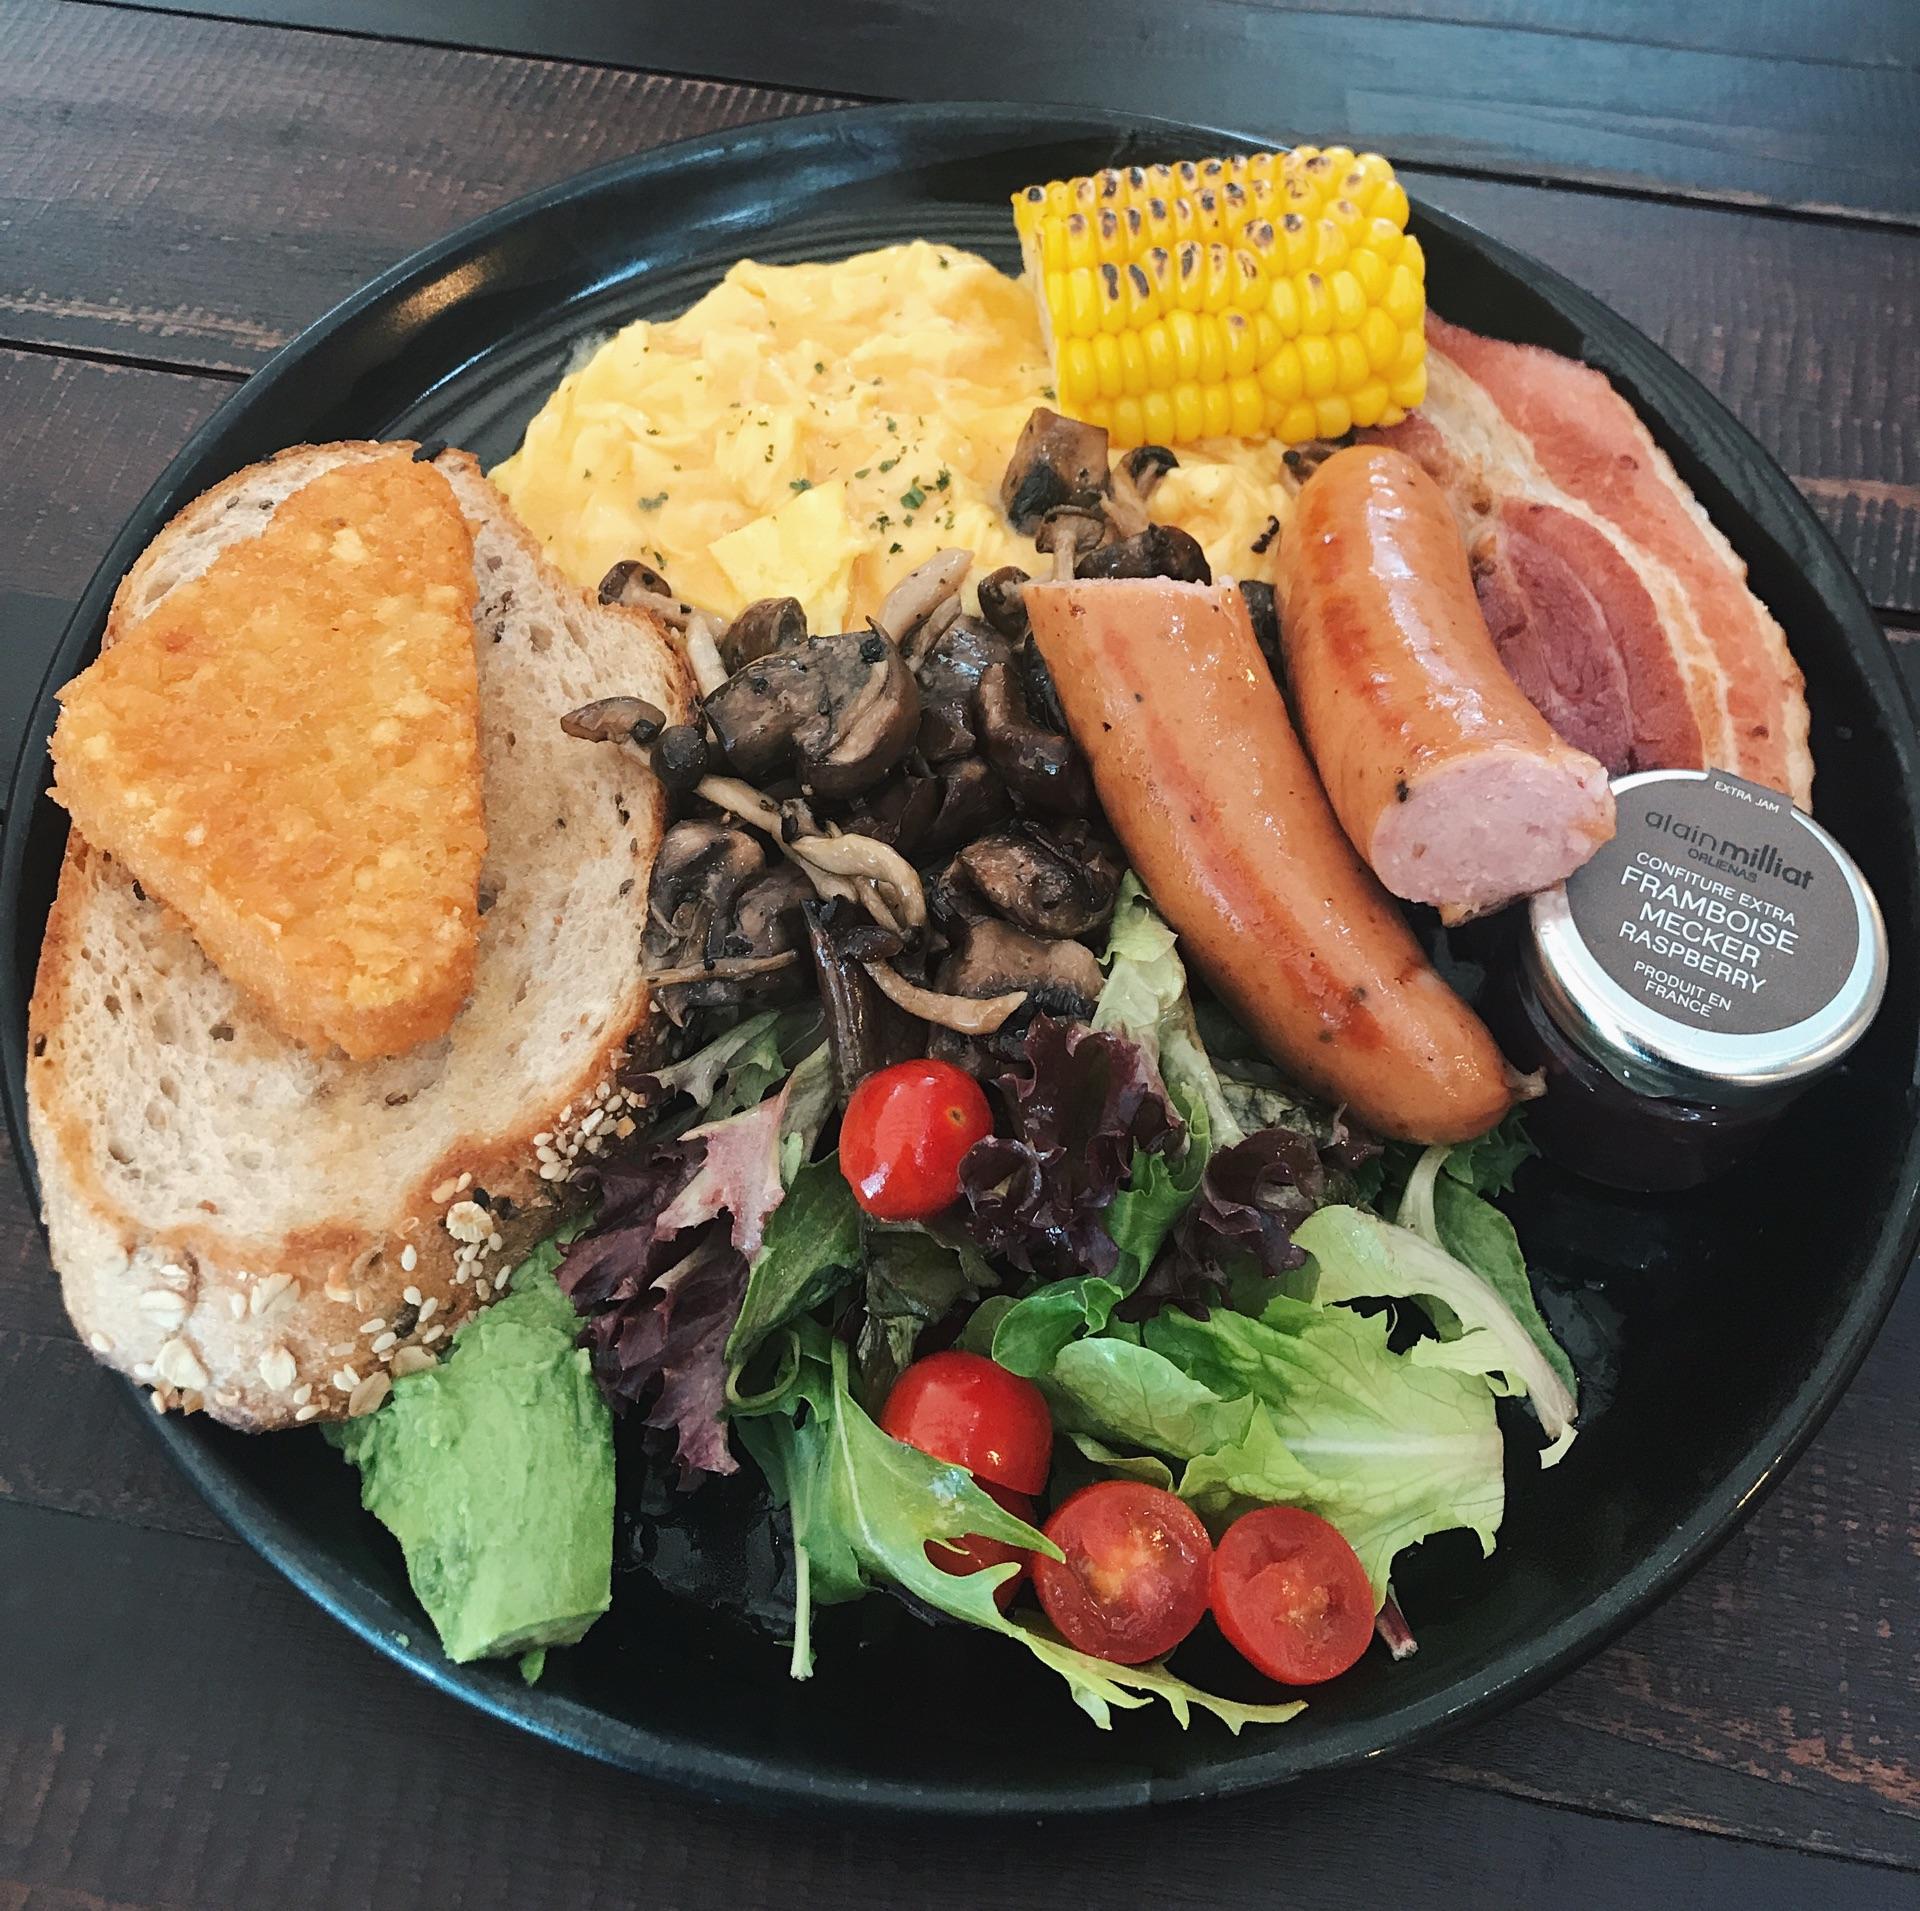 Breakfast Platter ($23)